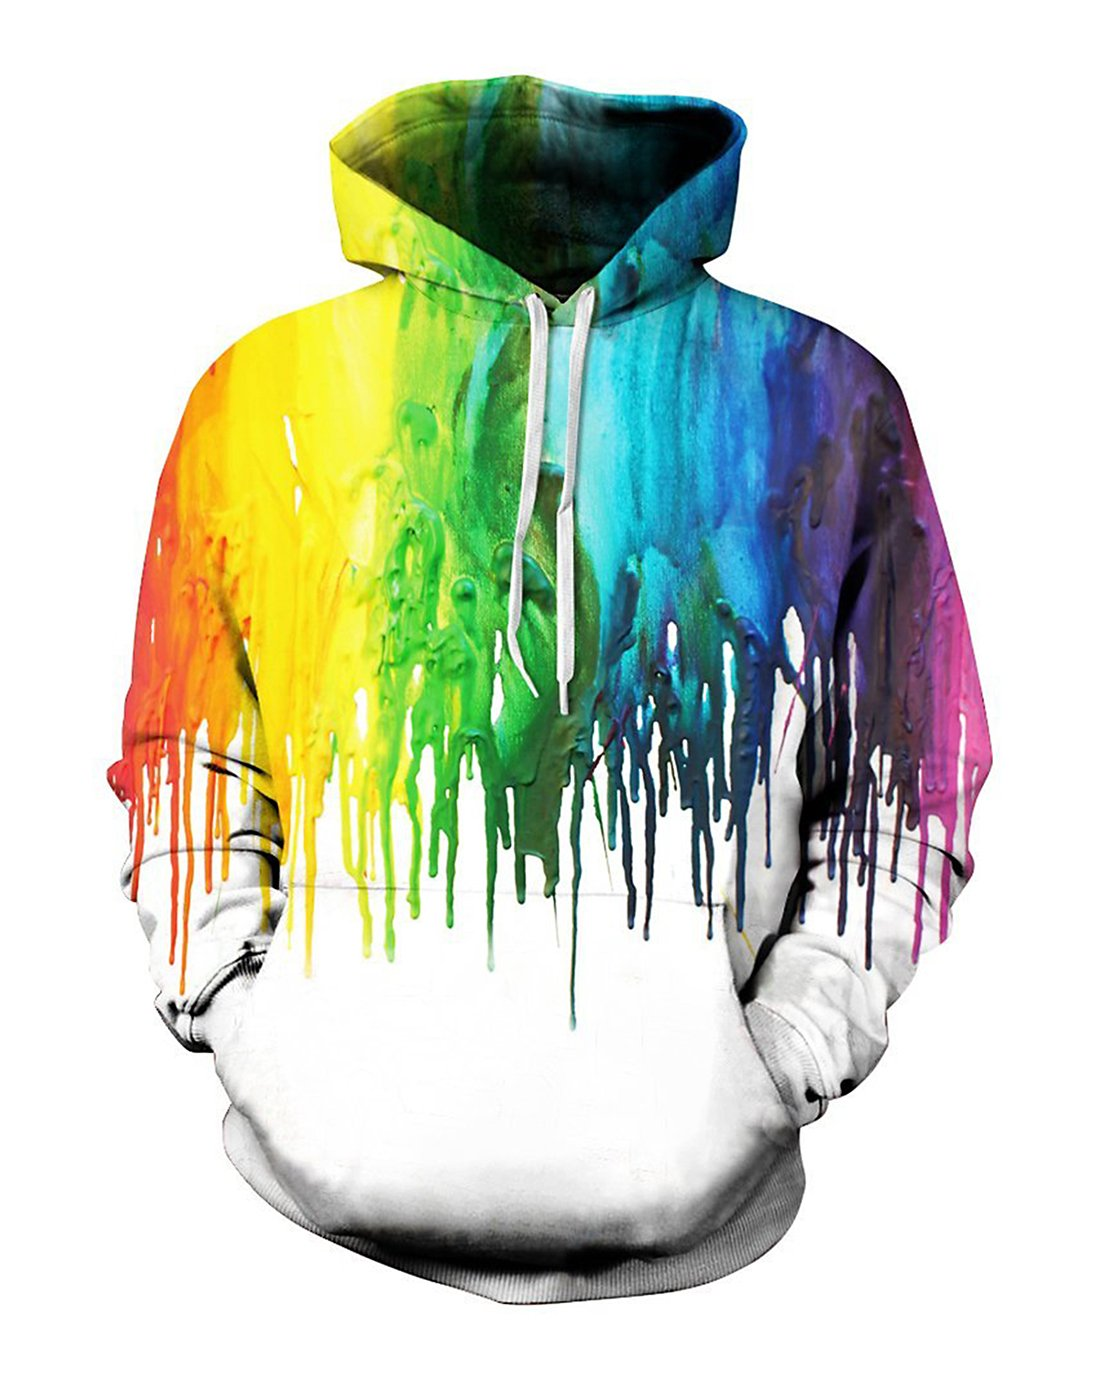 sankill Unisex 3D Digital Pullover Sweatshirt Printed Hoodies Funny Hooded Sweatshirt Pockets by sankill